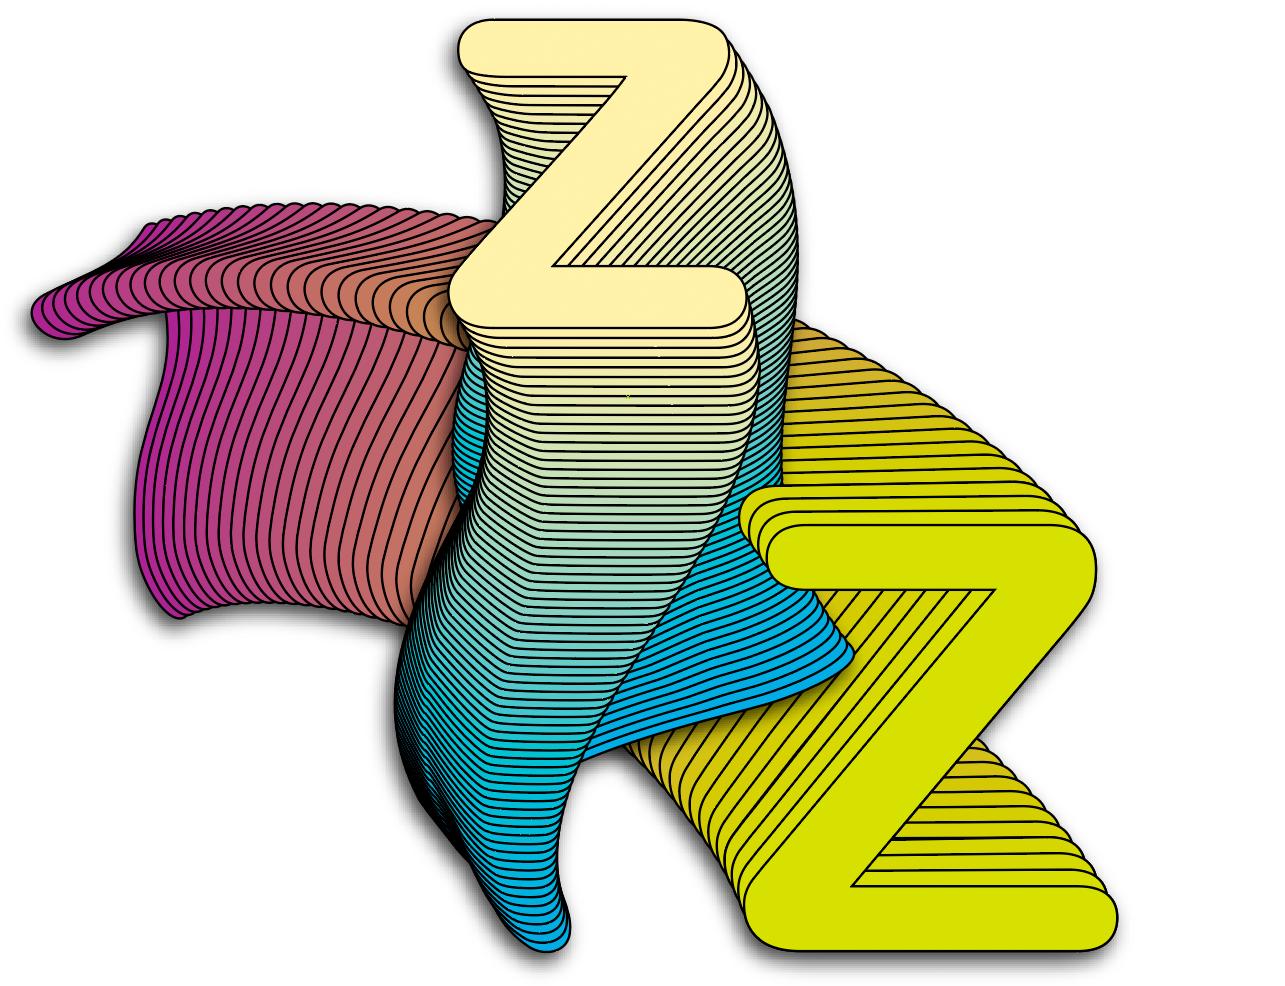 Dynamic Warp Distortions in Adobe Illustrator: Fish and Twist, a